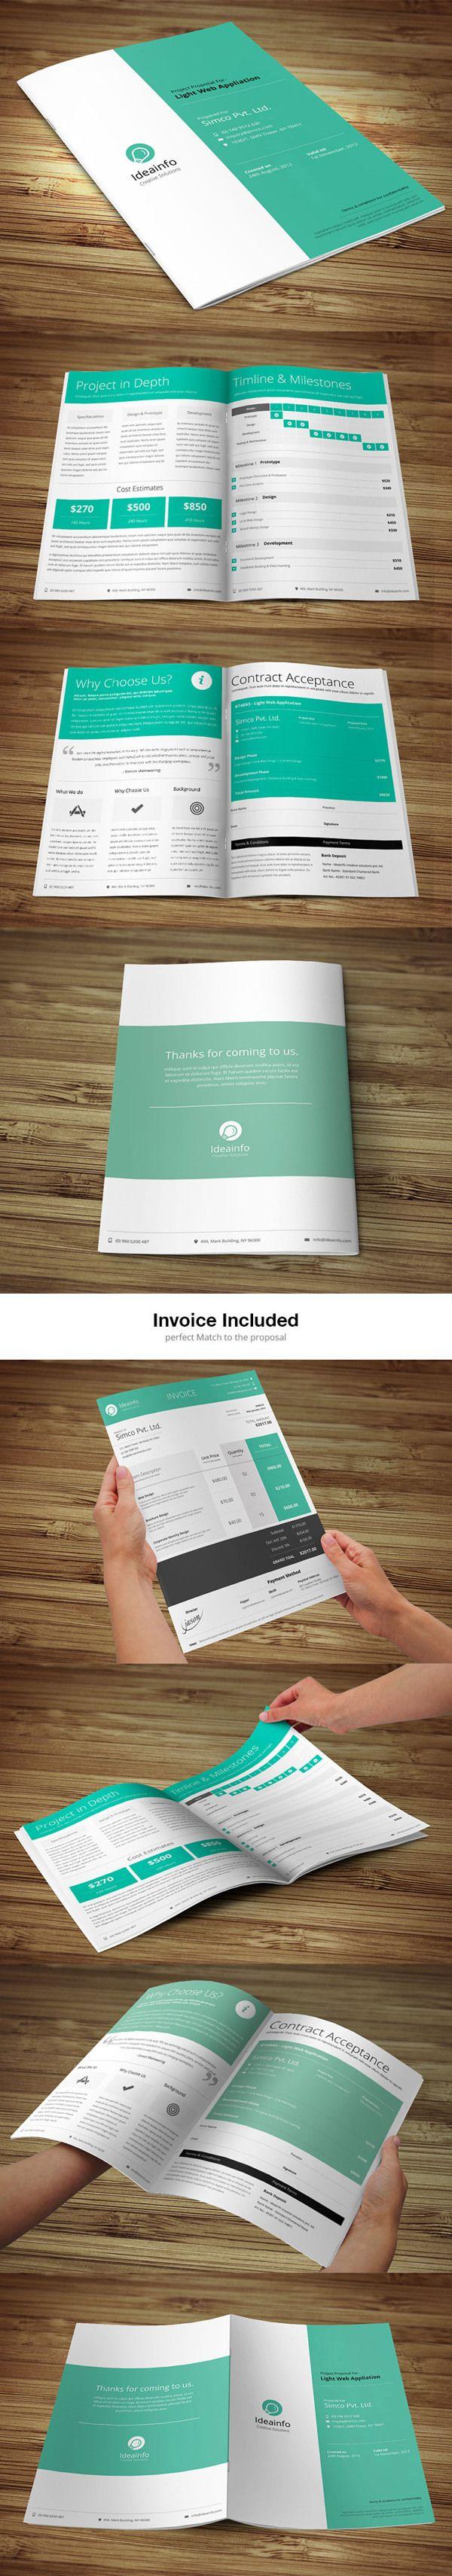 Short  & Quick Business Proposal by Bouncy Studio, via Behance